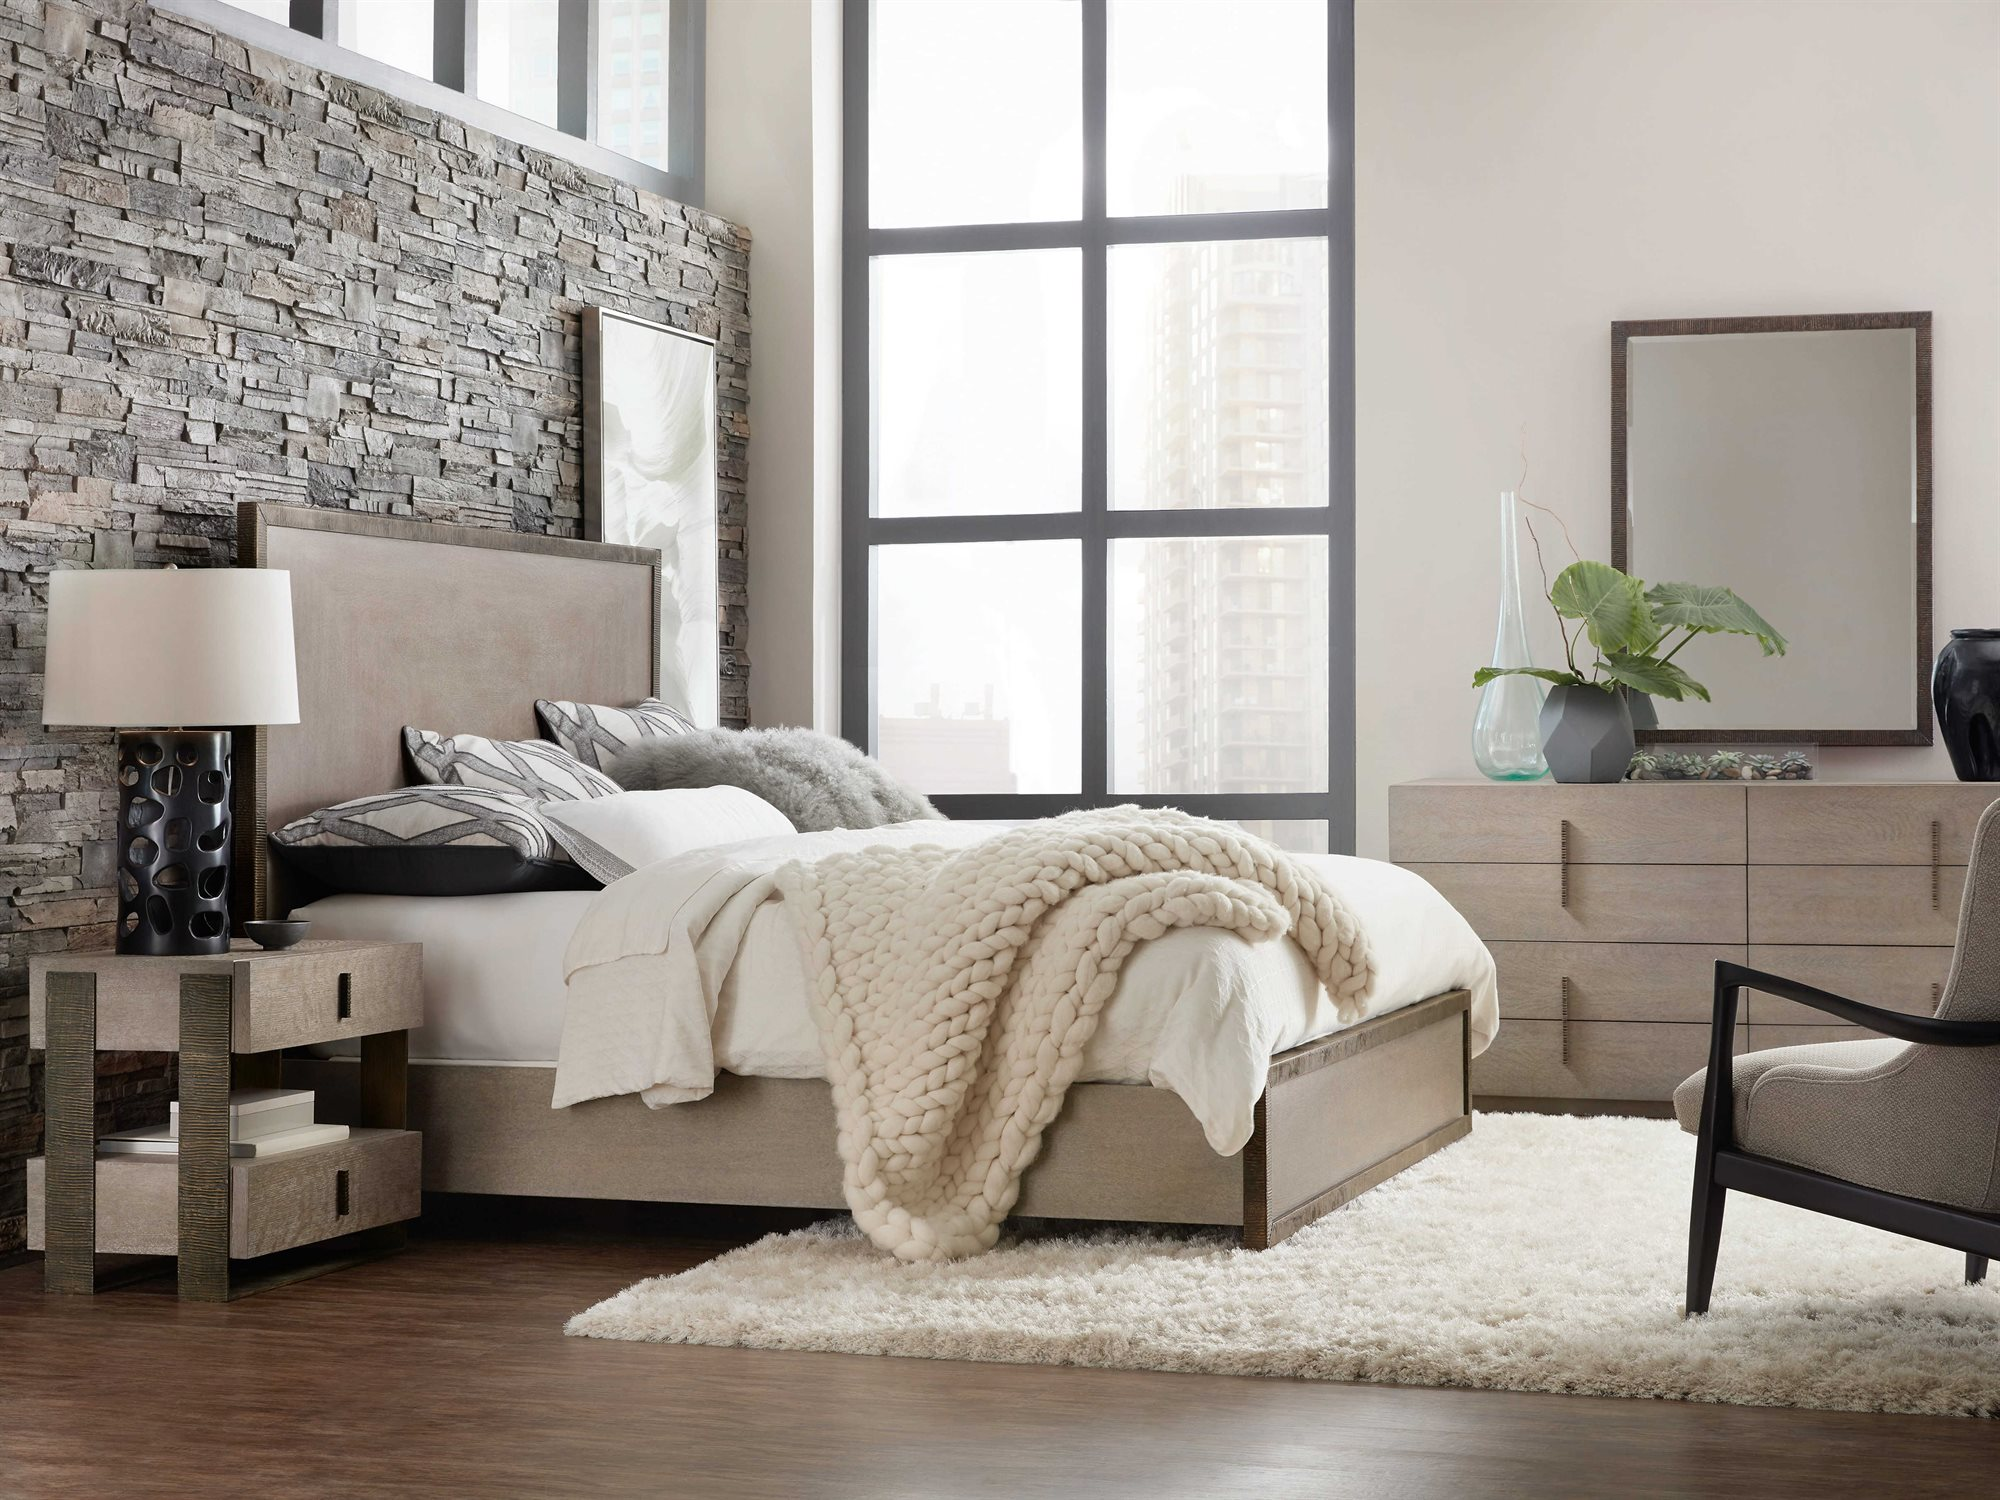 Hooker Furniture Miramar Carmel Bedroom Set